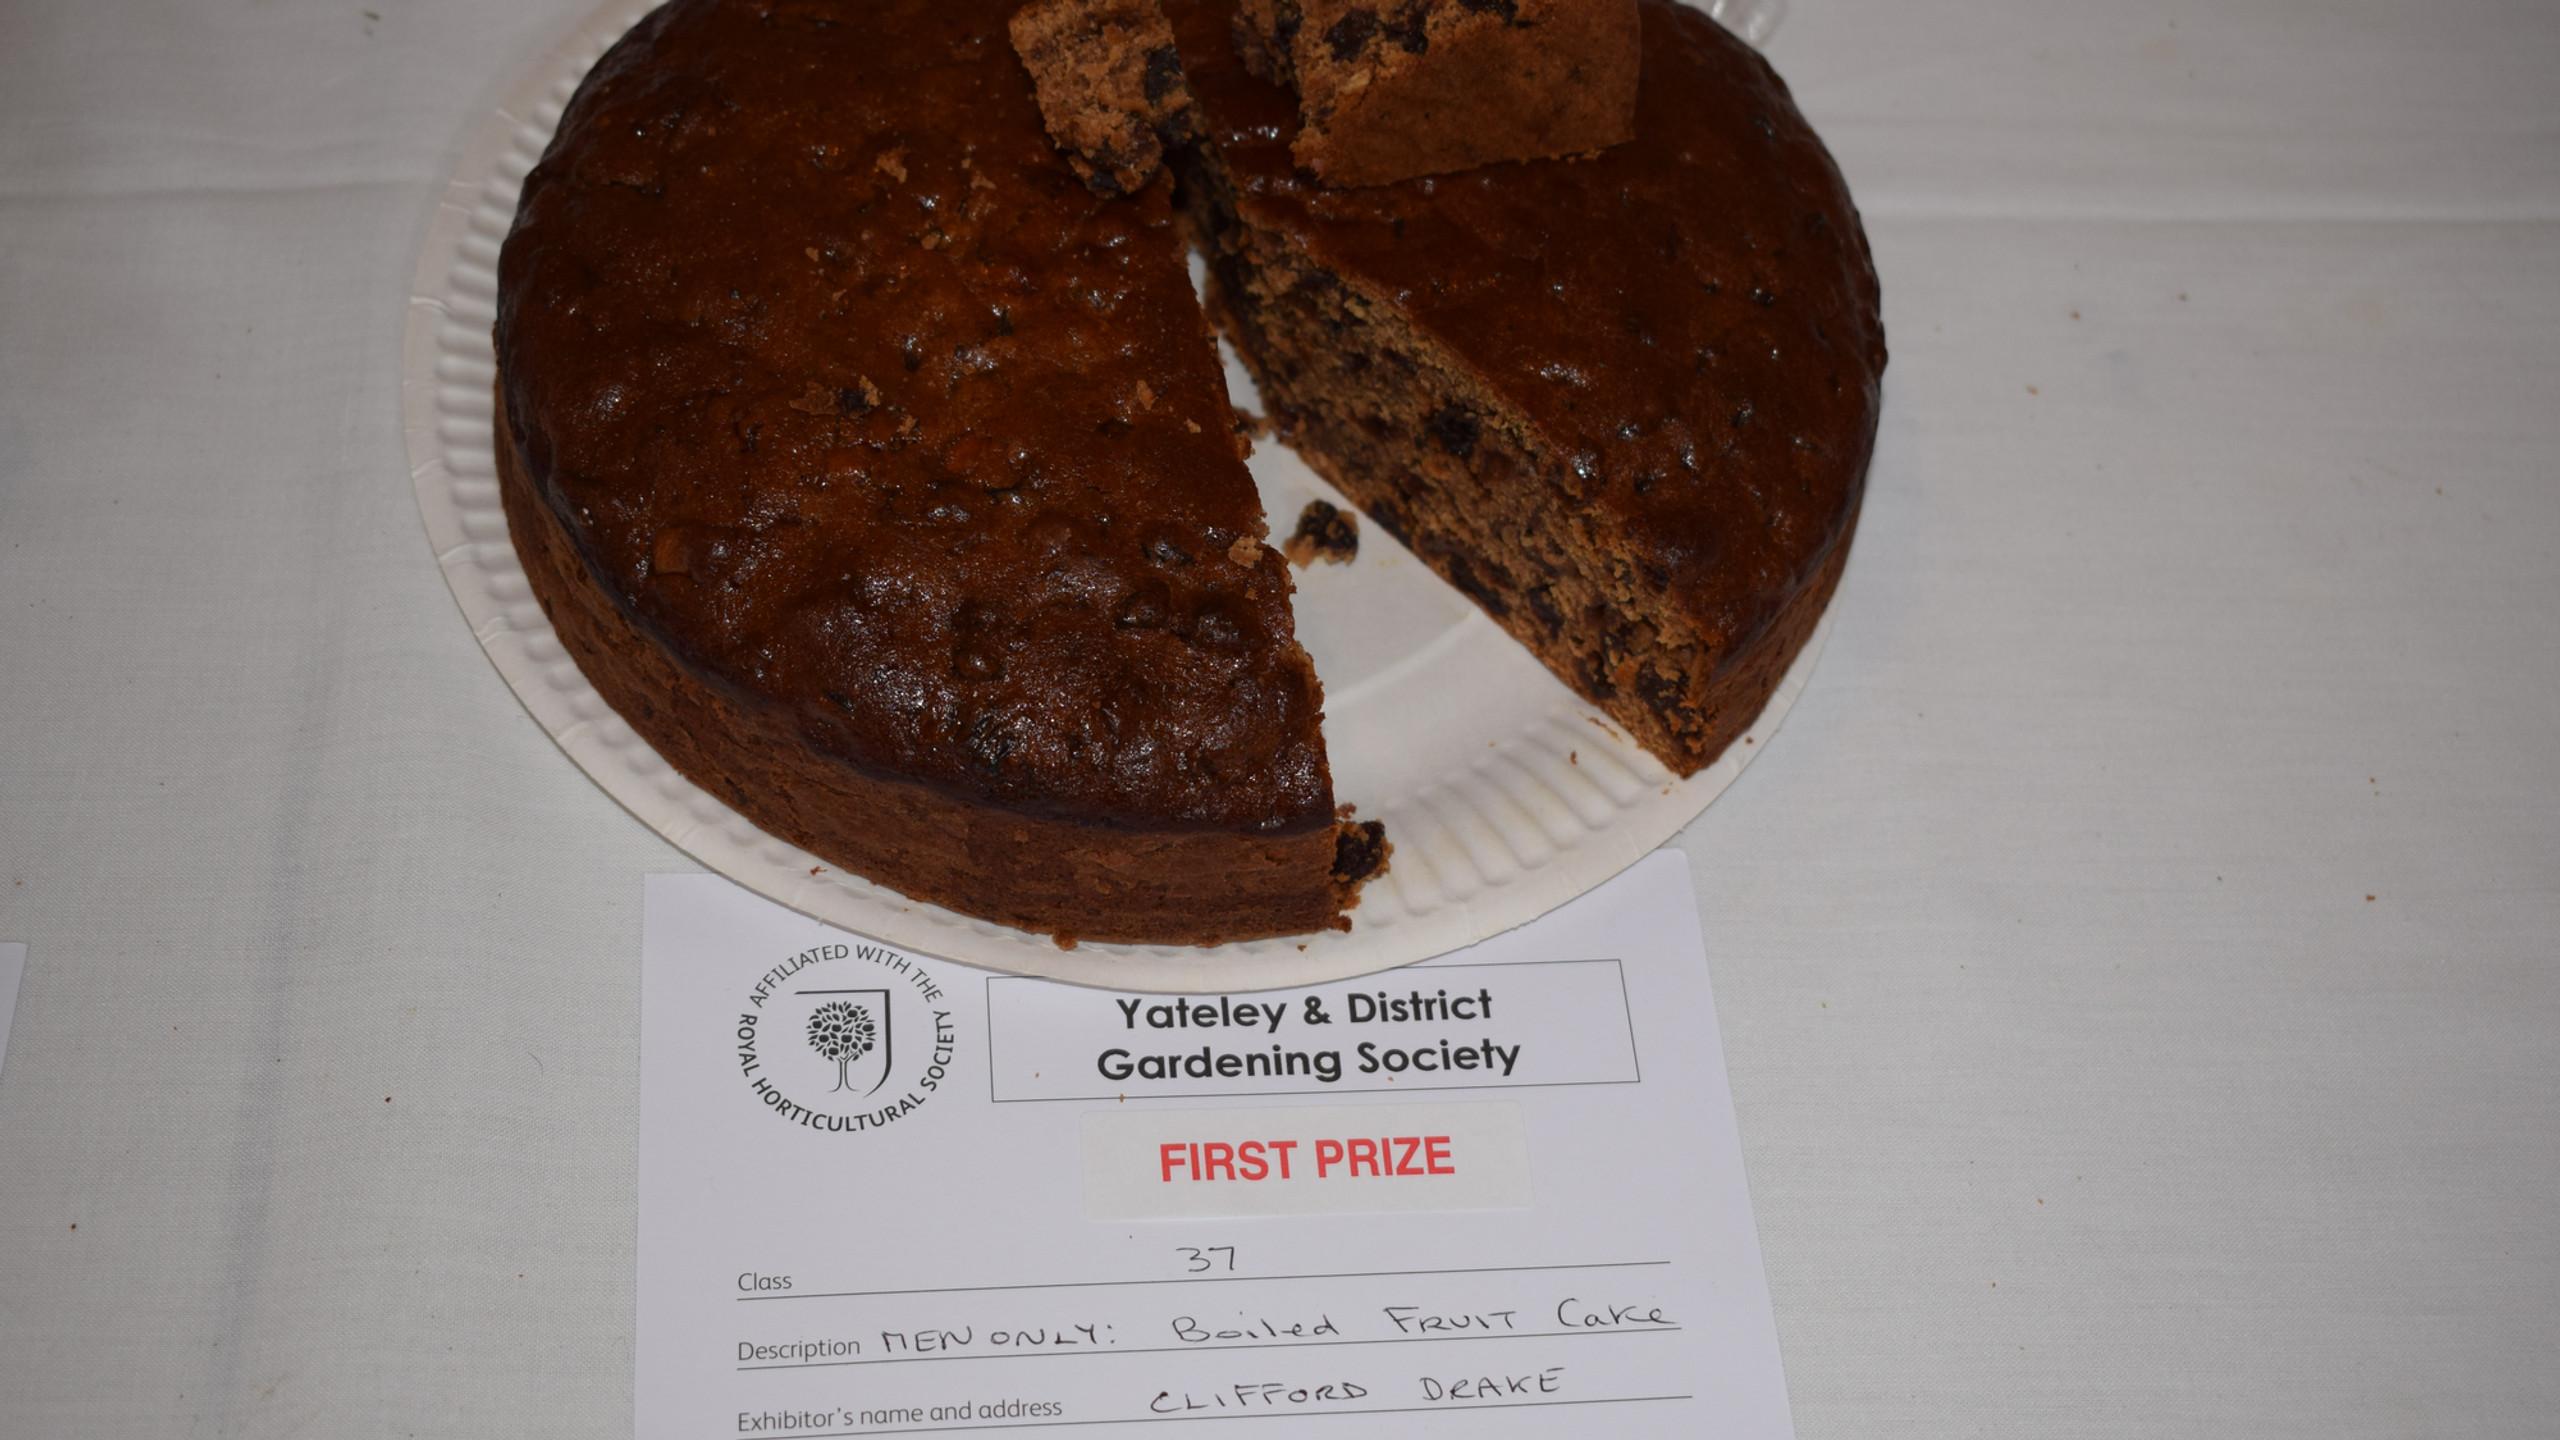 1st prize Boiled Fruit Cake